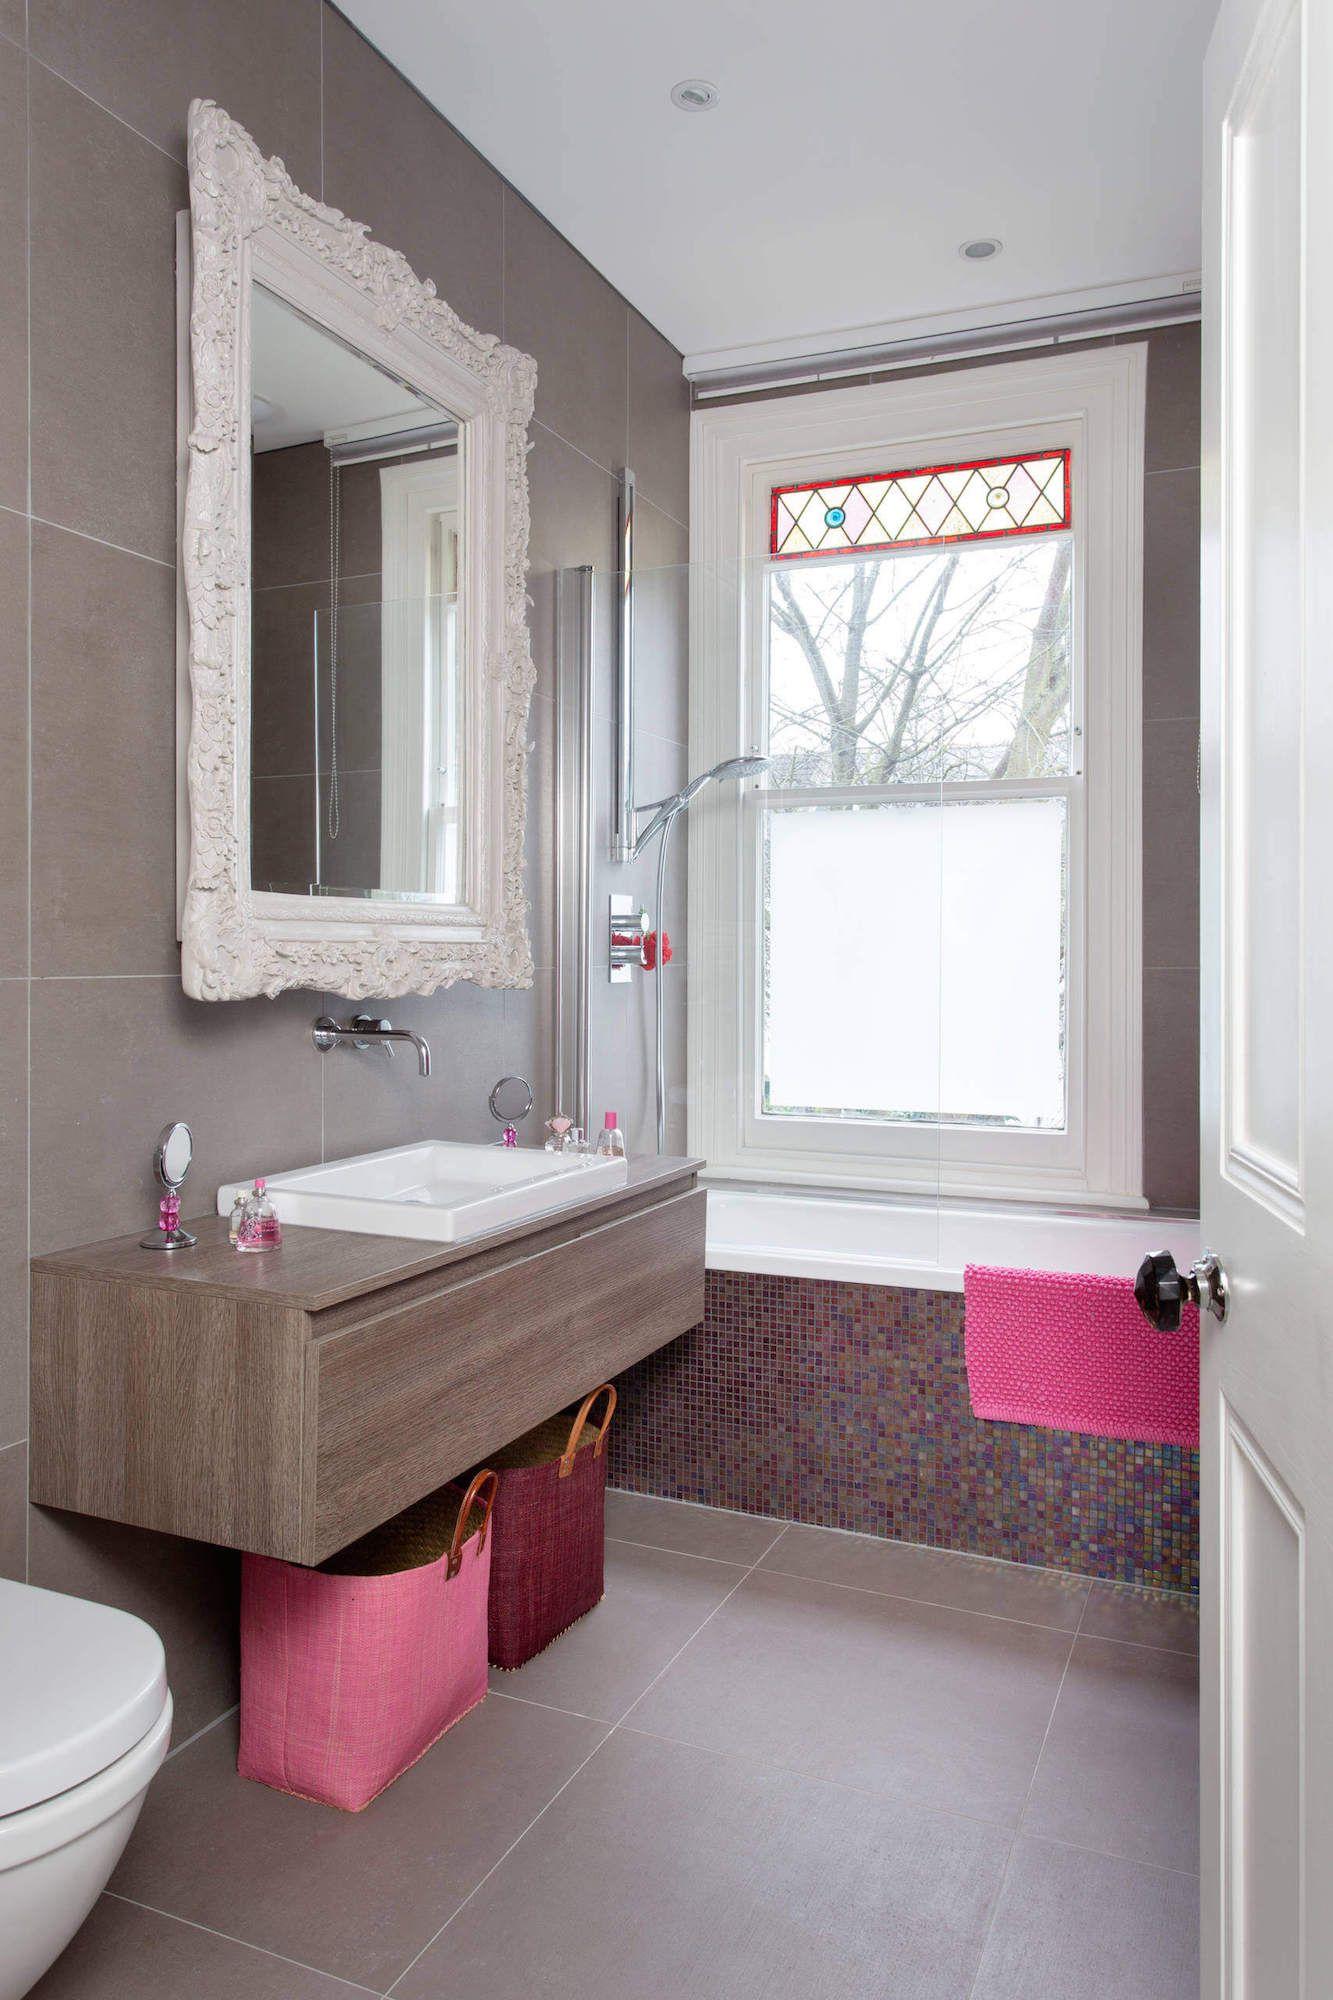 west-london-home-frenchstef-interior-design-08